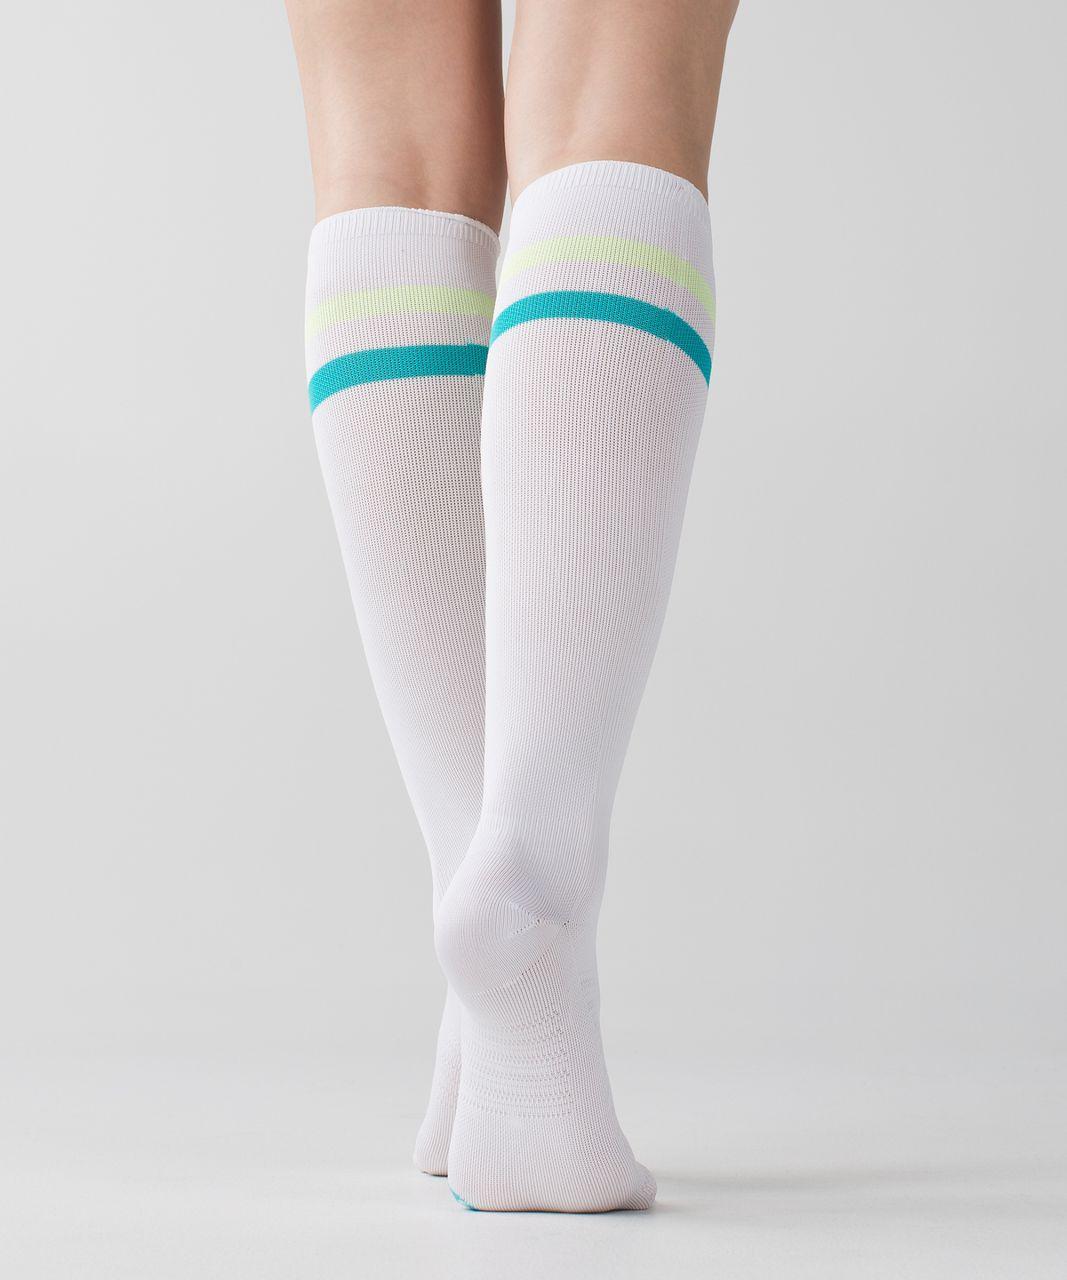 Lululemon Women's Keep It Tight Sock - Varsity Stripe White Clear Mint Blue Tropics